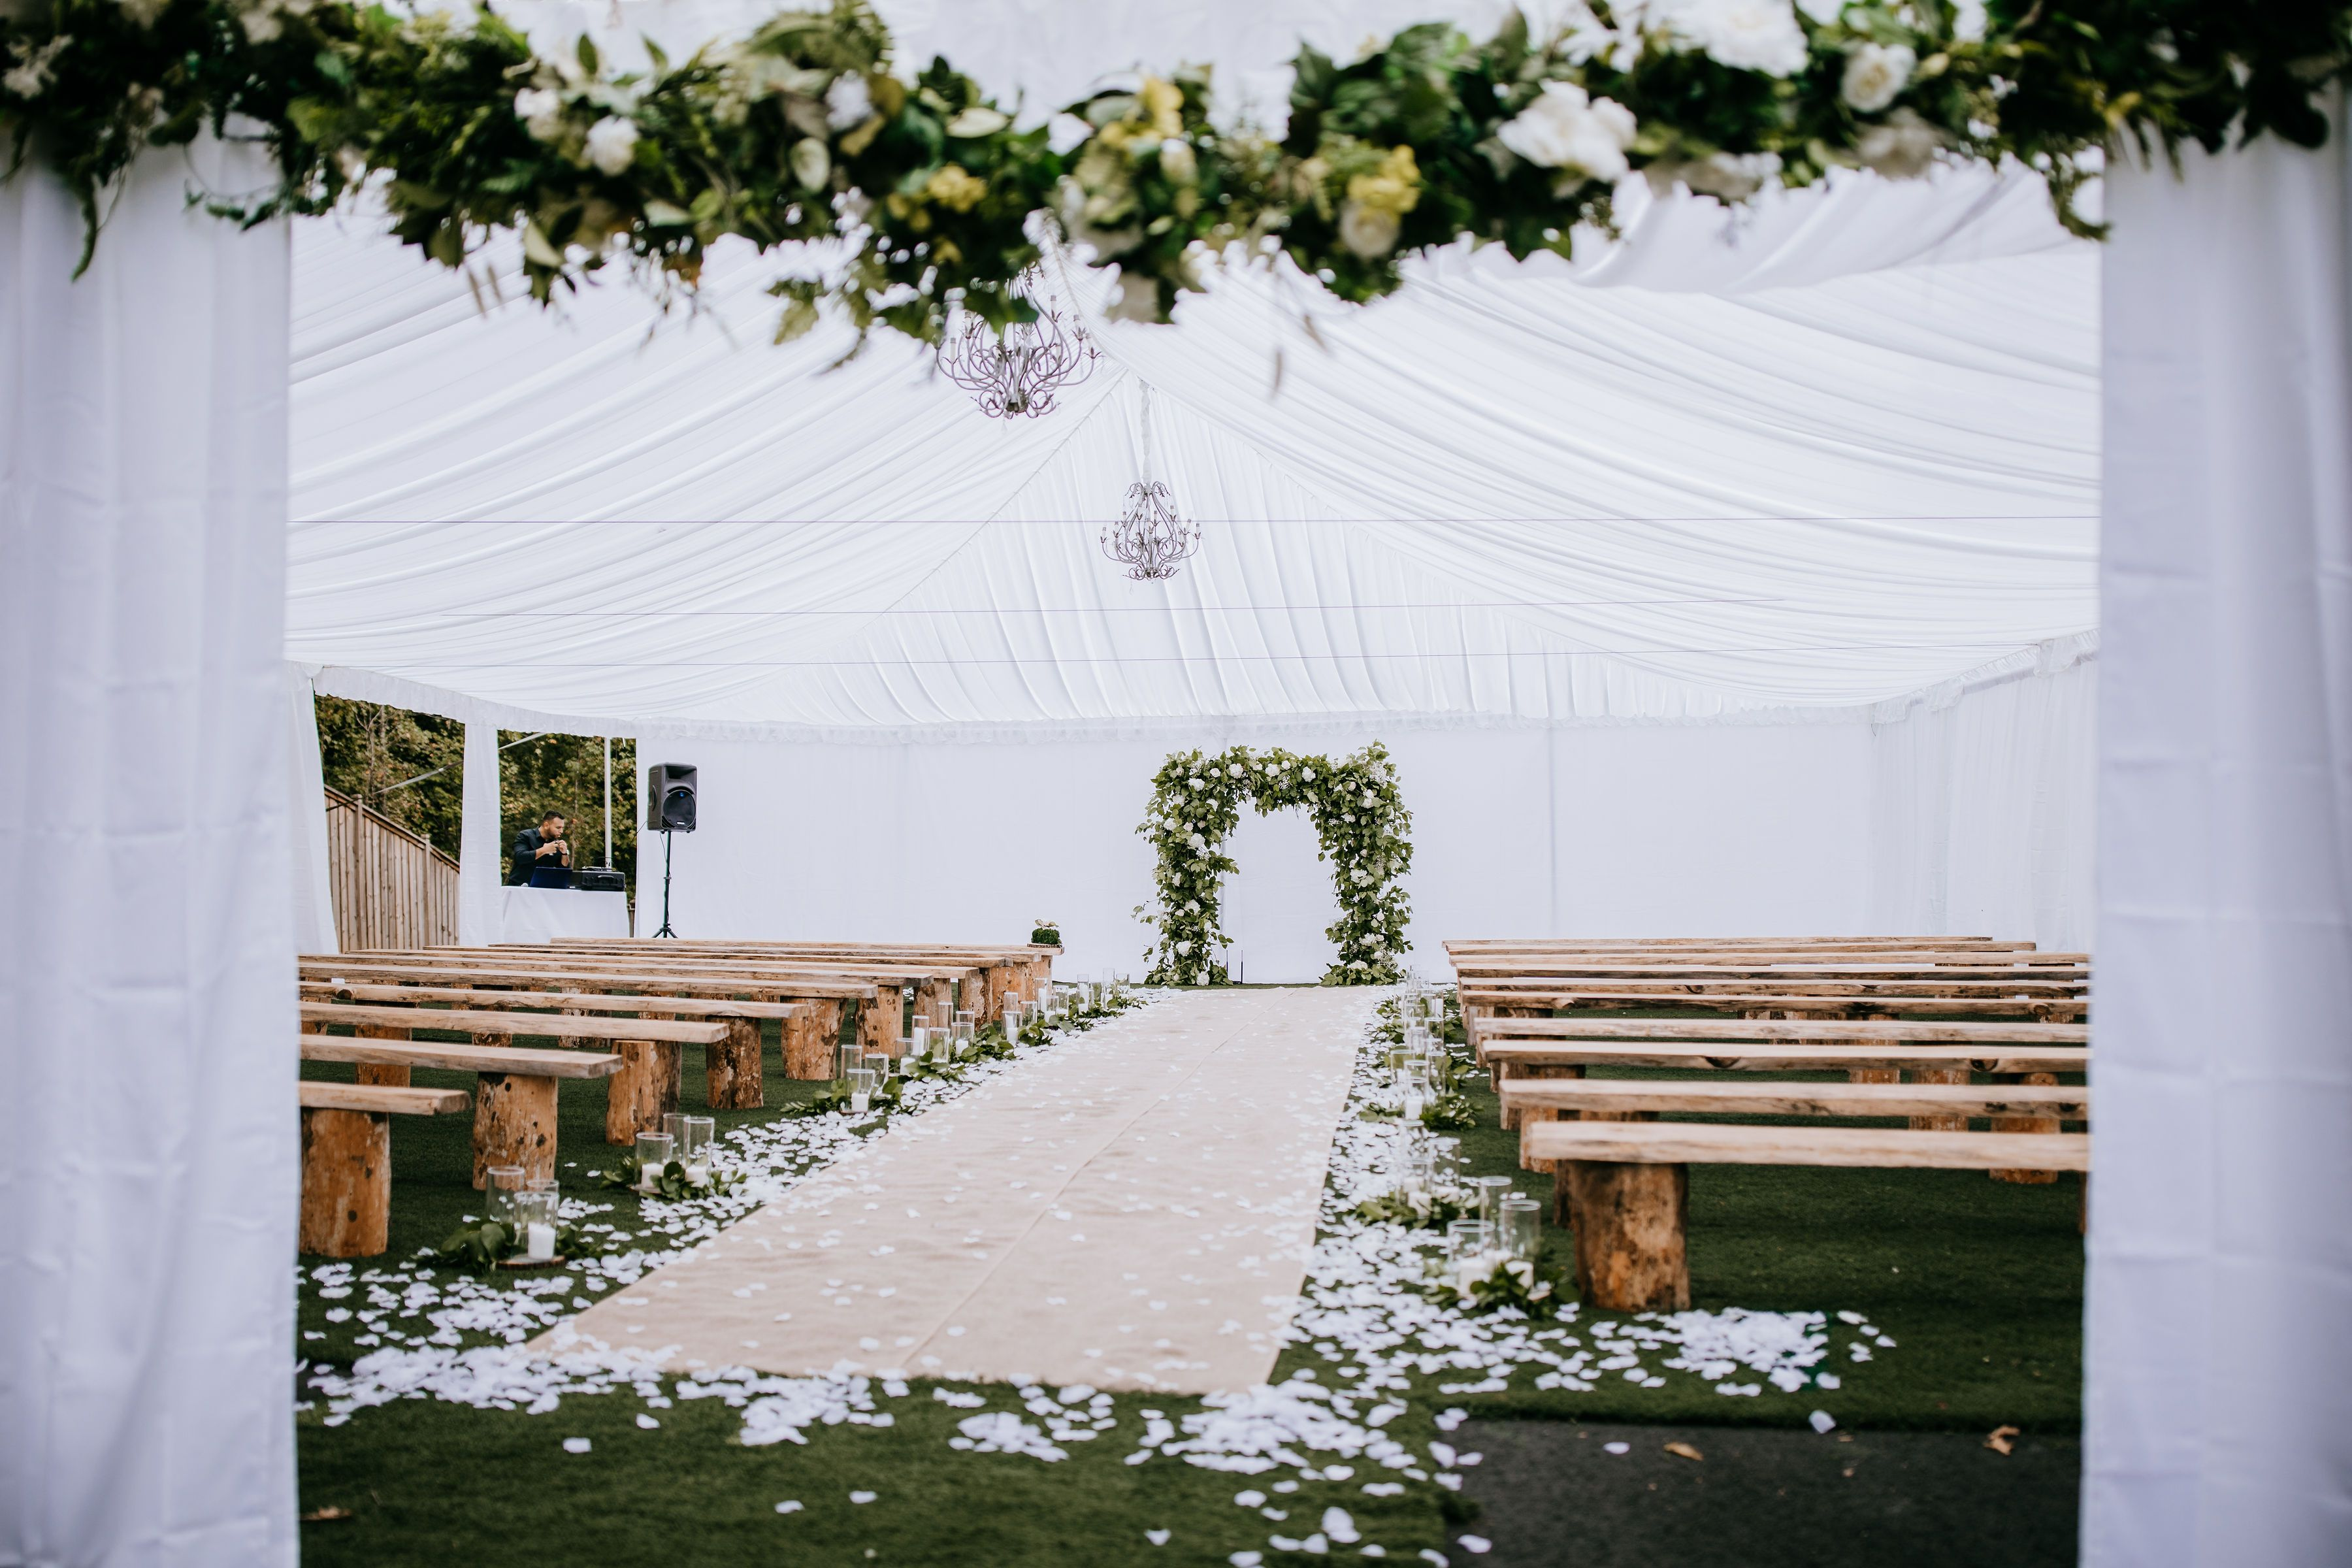 Alpharetta Parking Lot Turned Into A Beautiful Wedding Ceremony Wedding Ceremony Beautiful Weddings Wedding